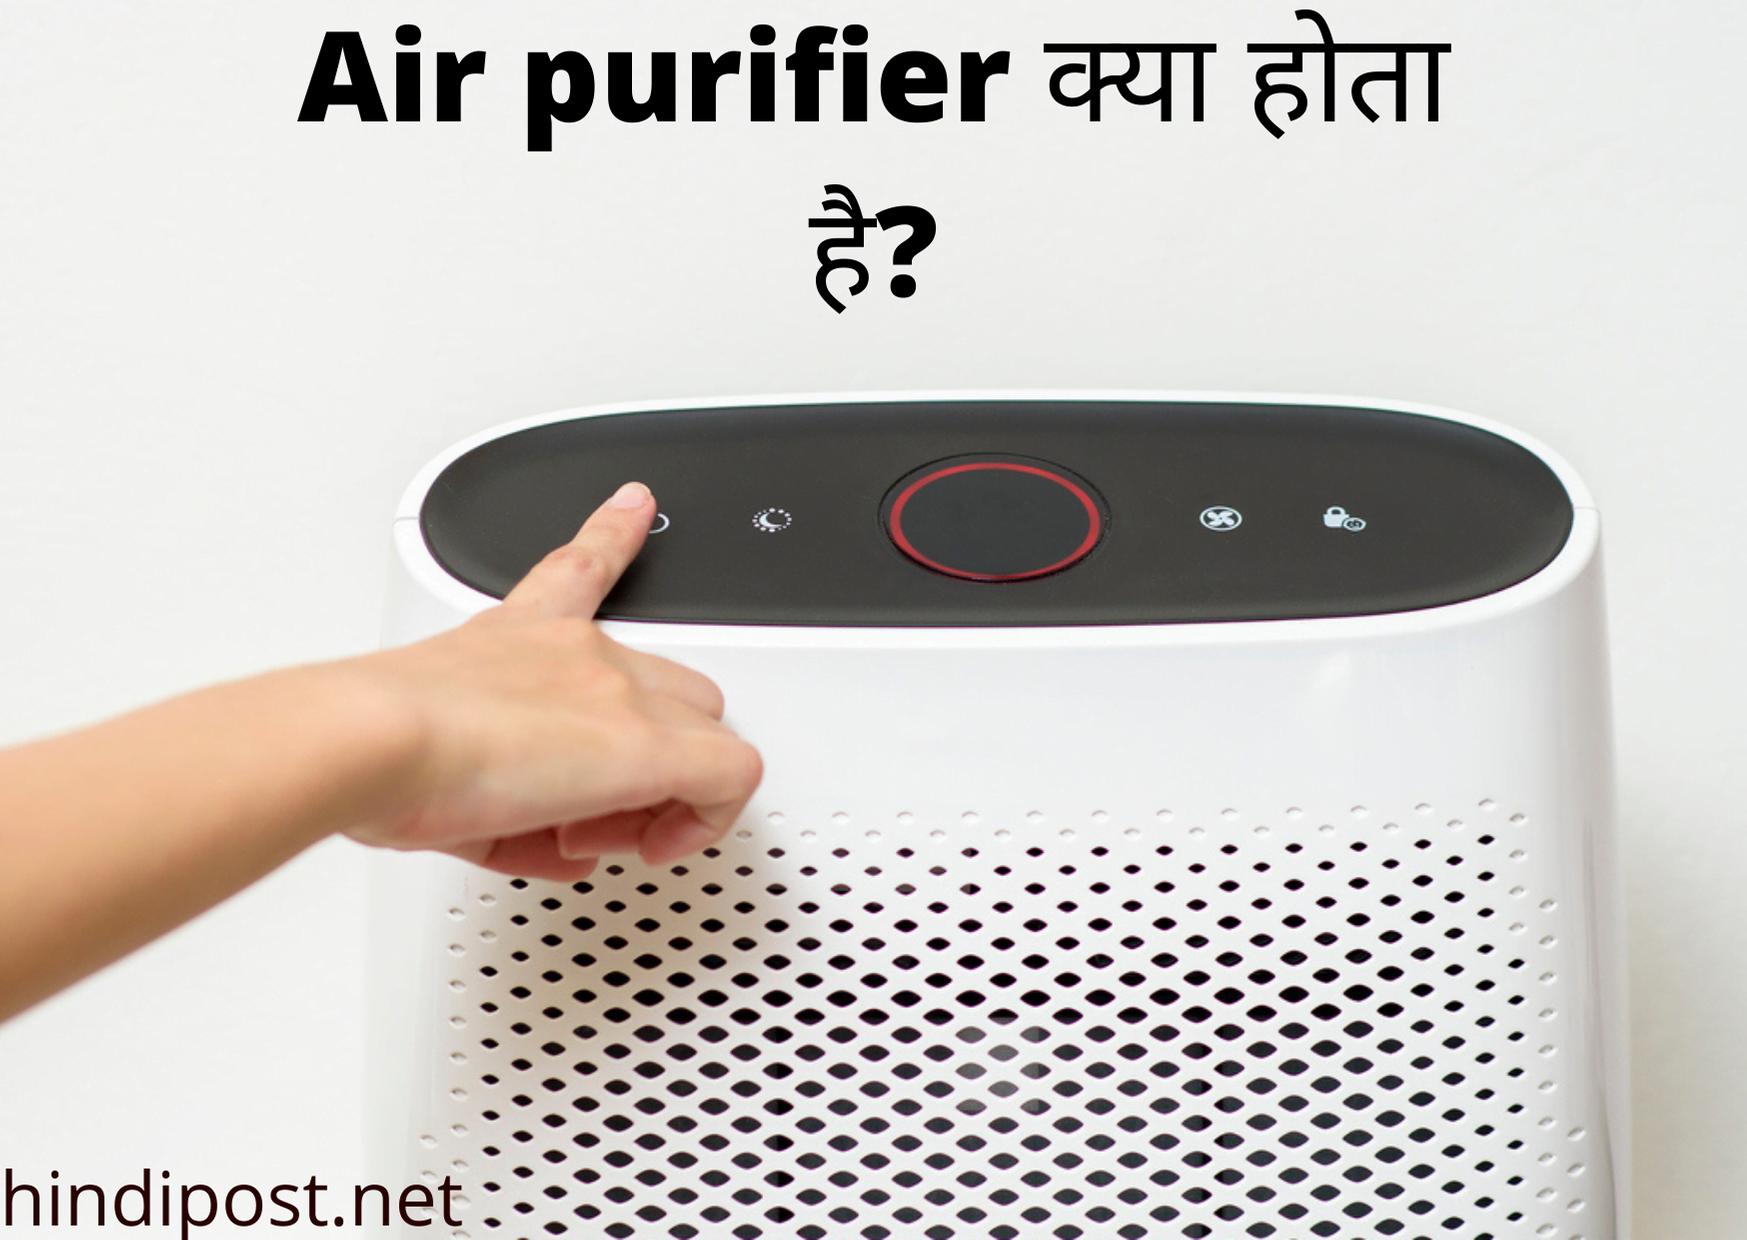 Air purifier क्या होता है?